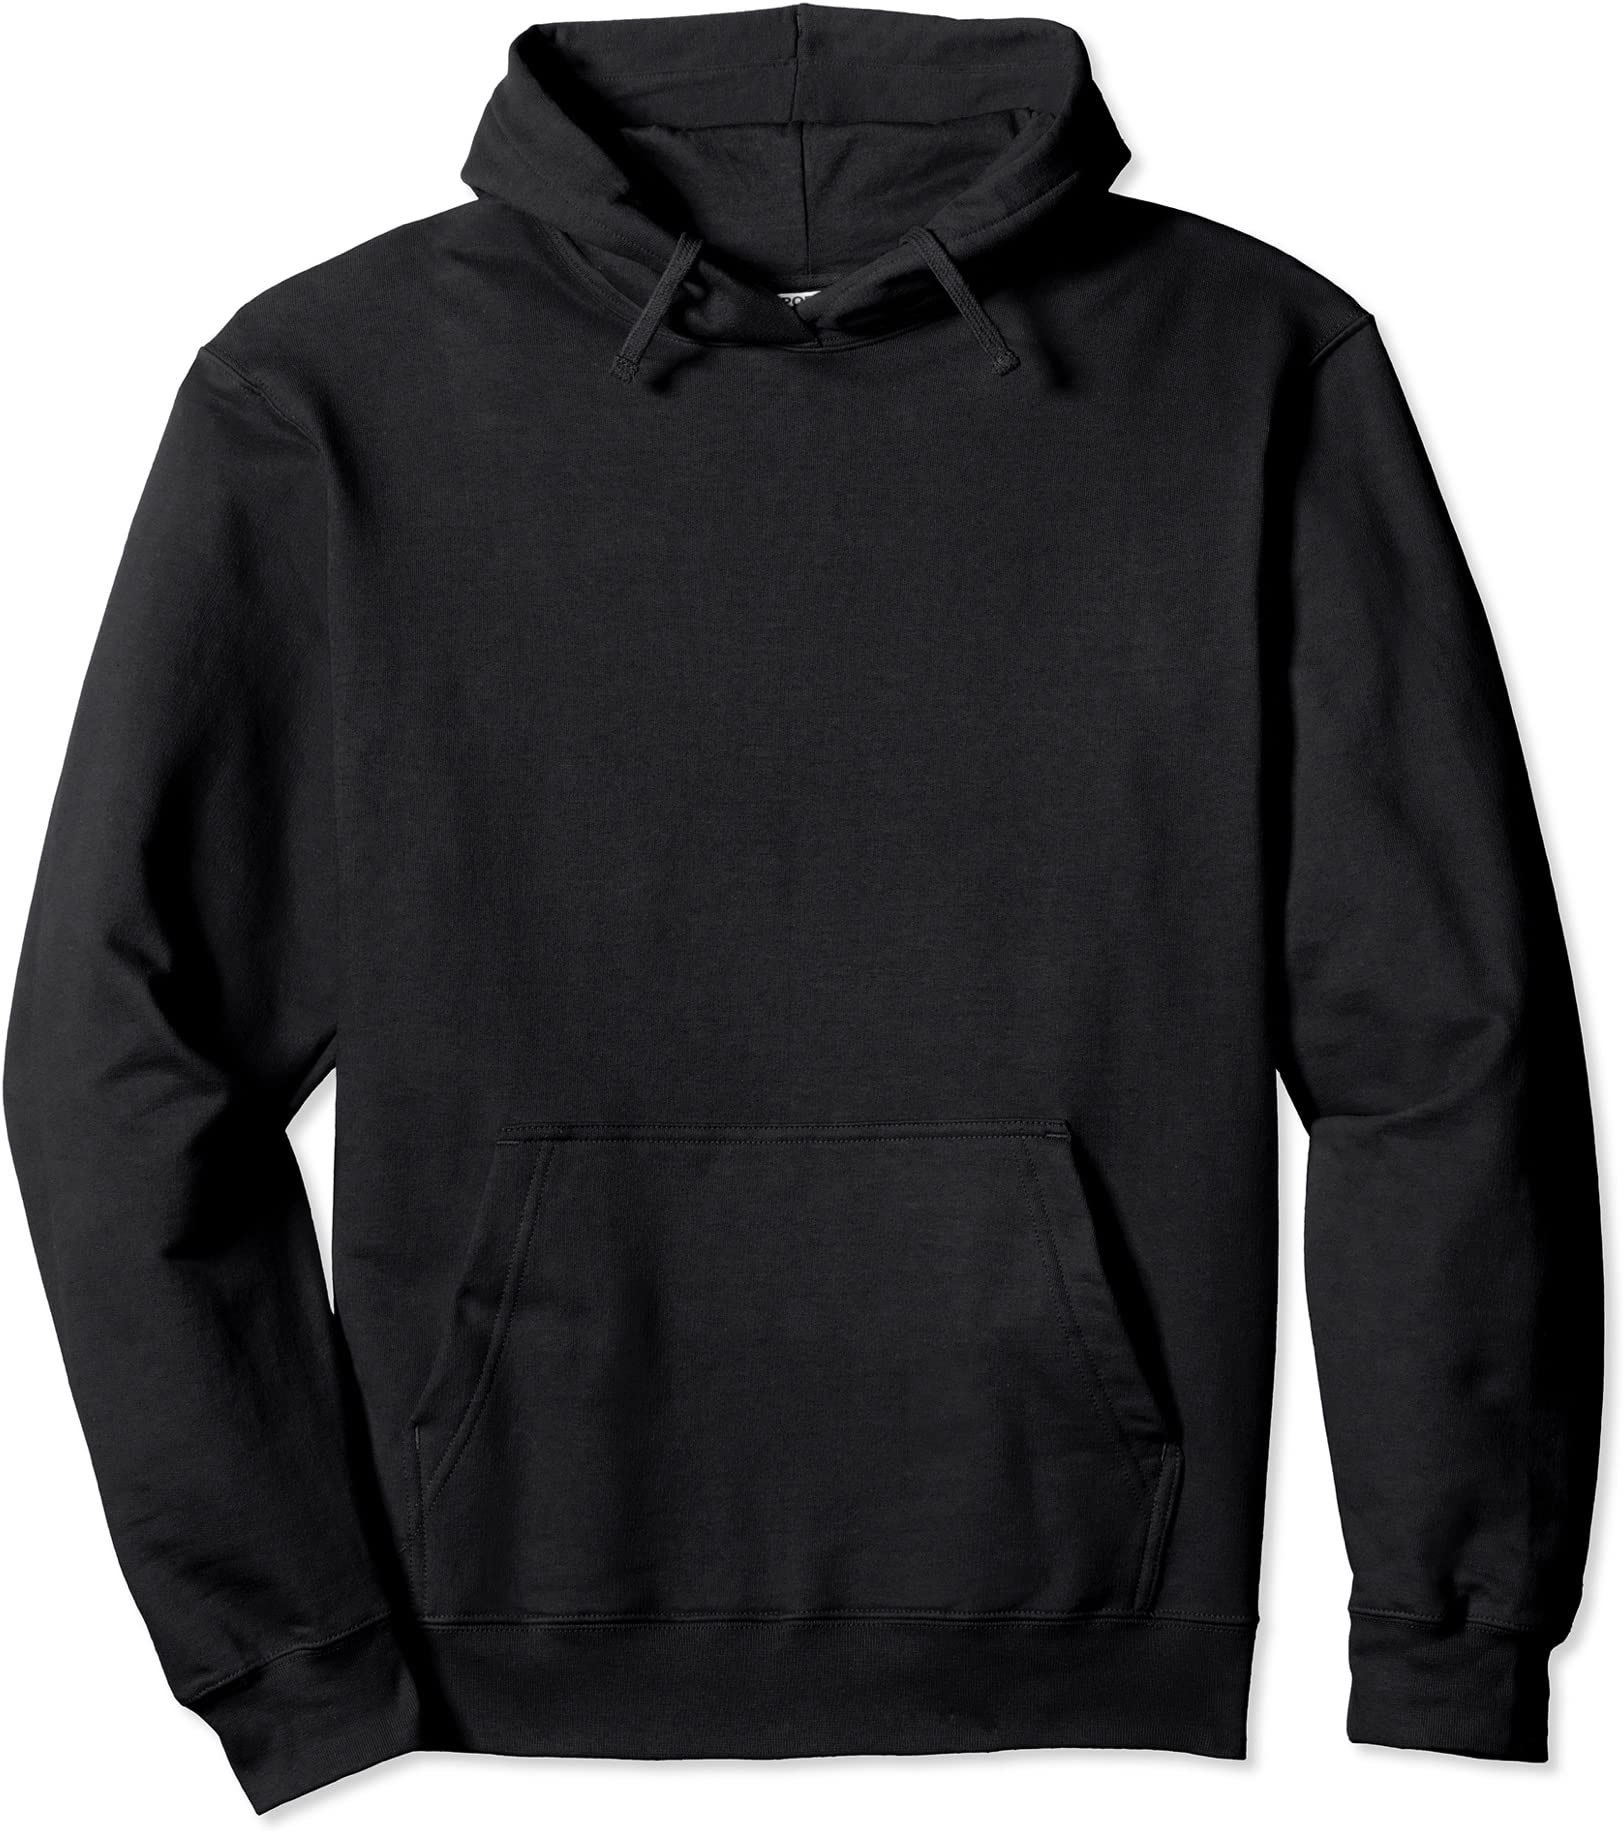 All Lives Matter Hoodie Sweatshirt